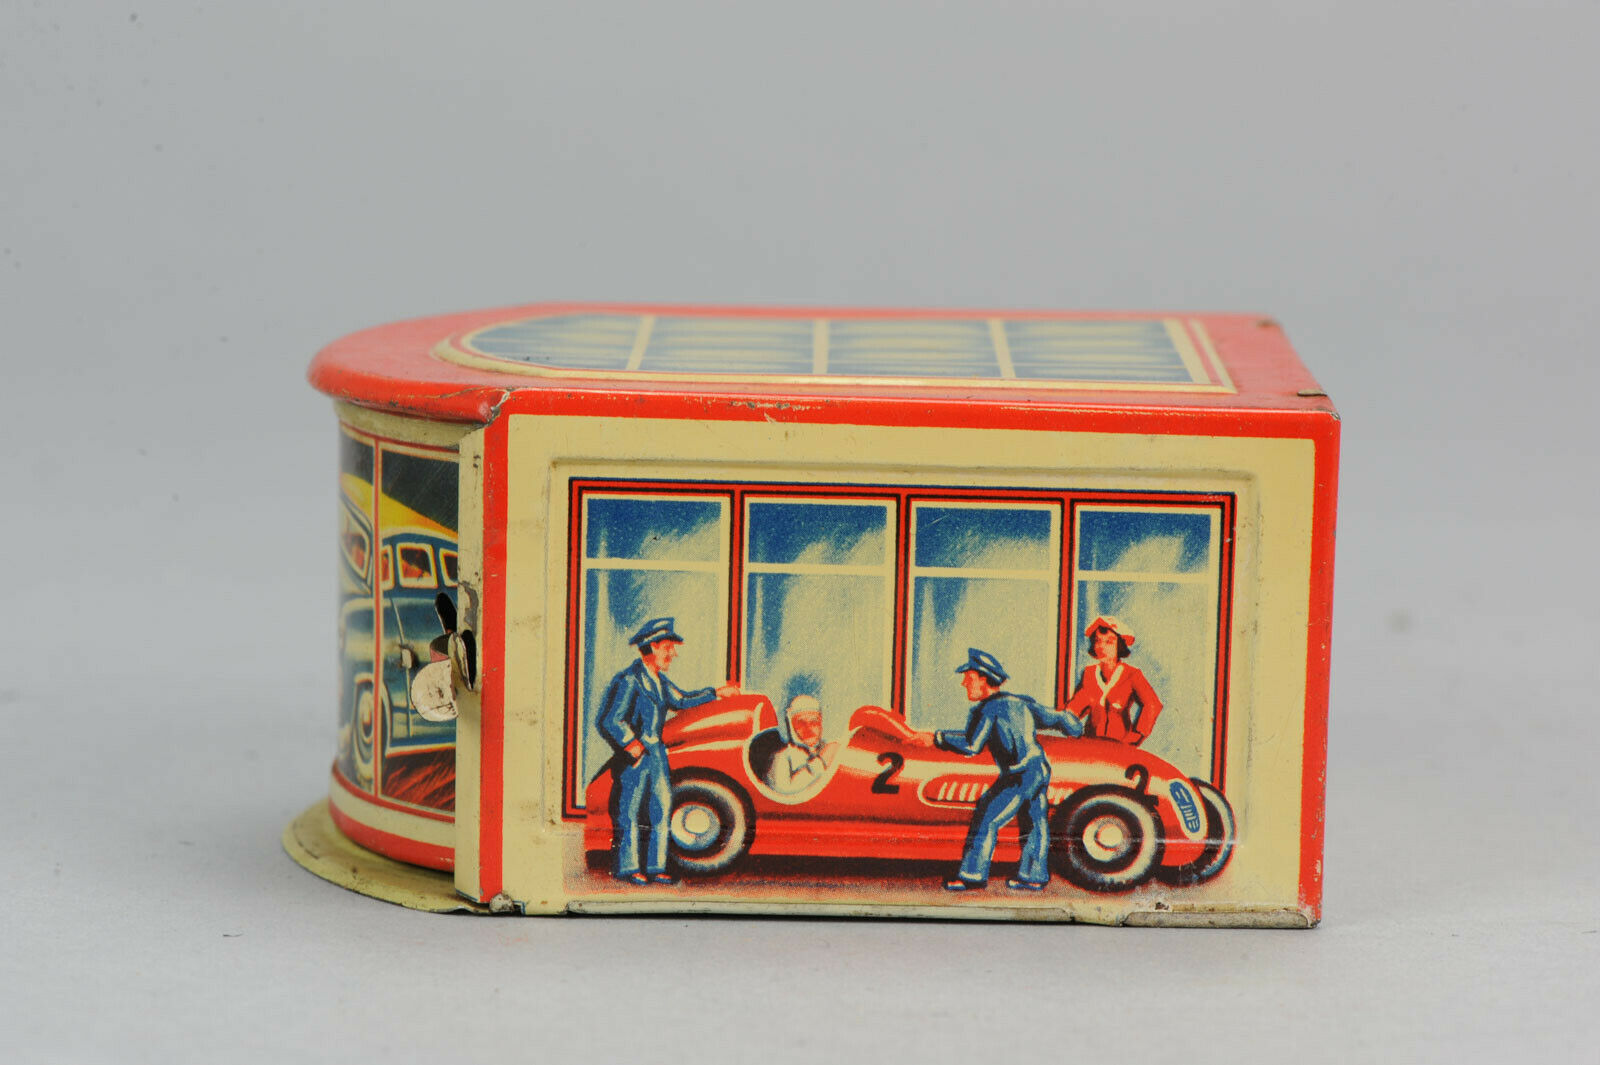 _AntiqueTin leksakare Sällsynt Gescha Pennyleksak Formula 1 Garage Tyskland